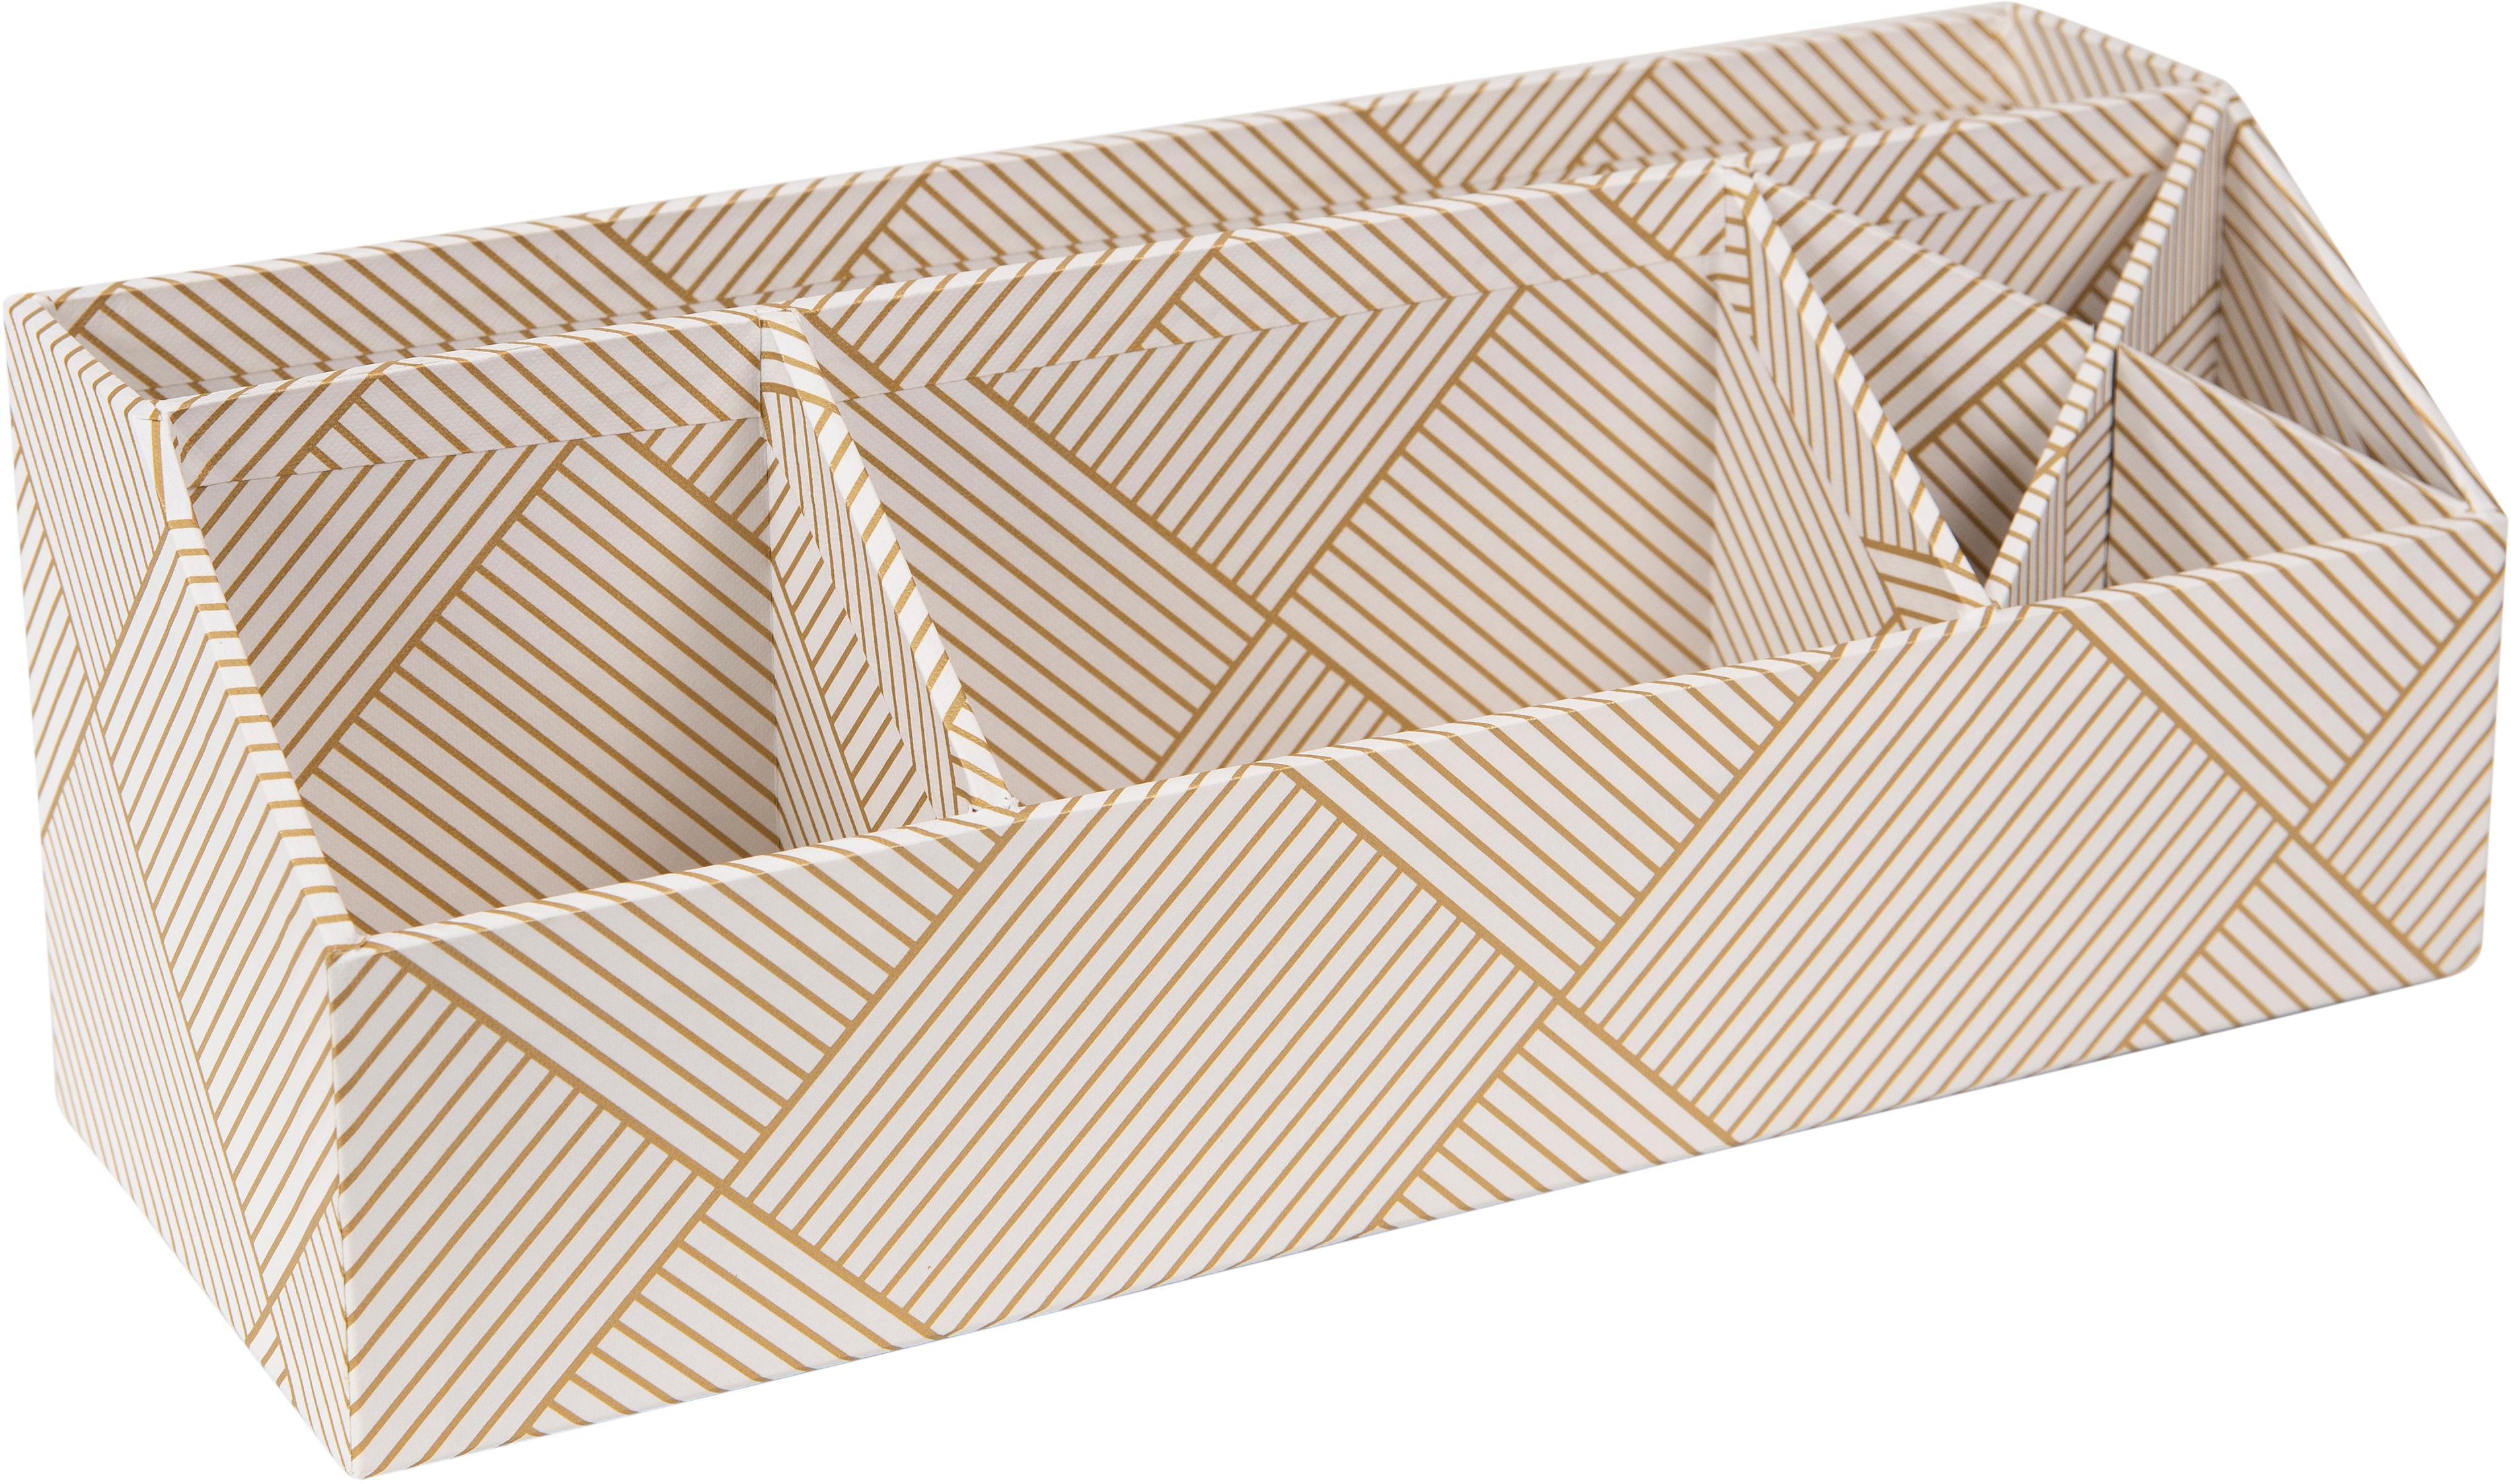 Büro-Organizer Elisa, Fester, laminierter Karton, Goldfarben, Weiß, 33 x 13 cm